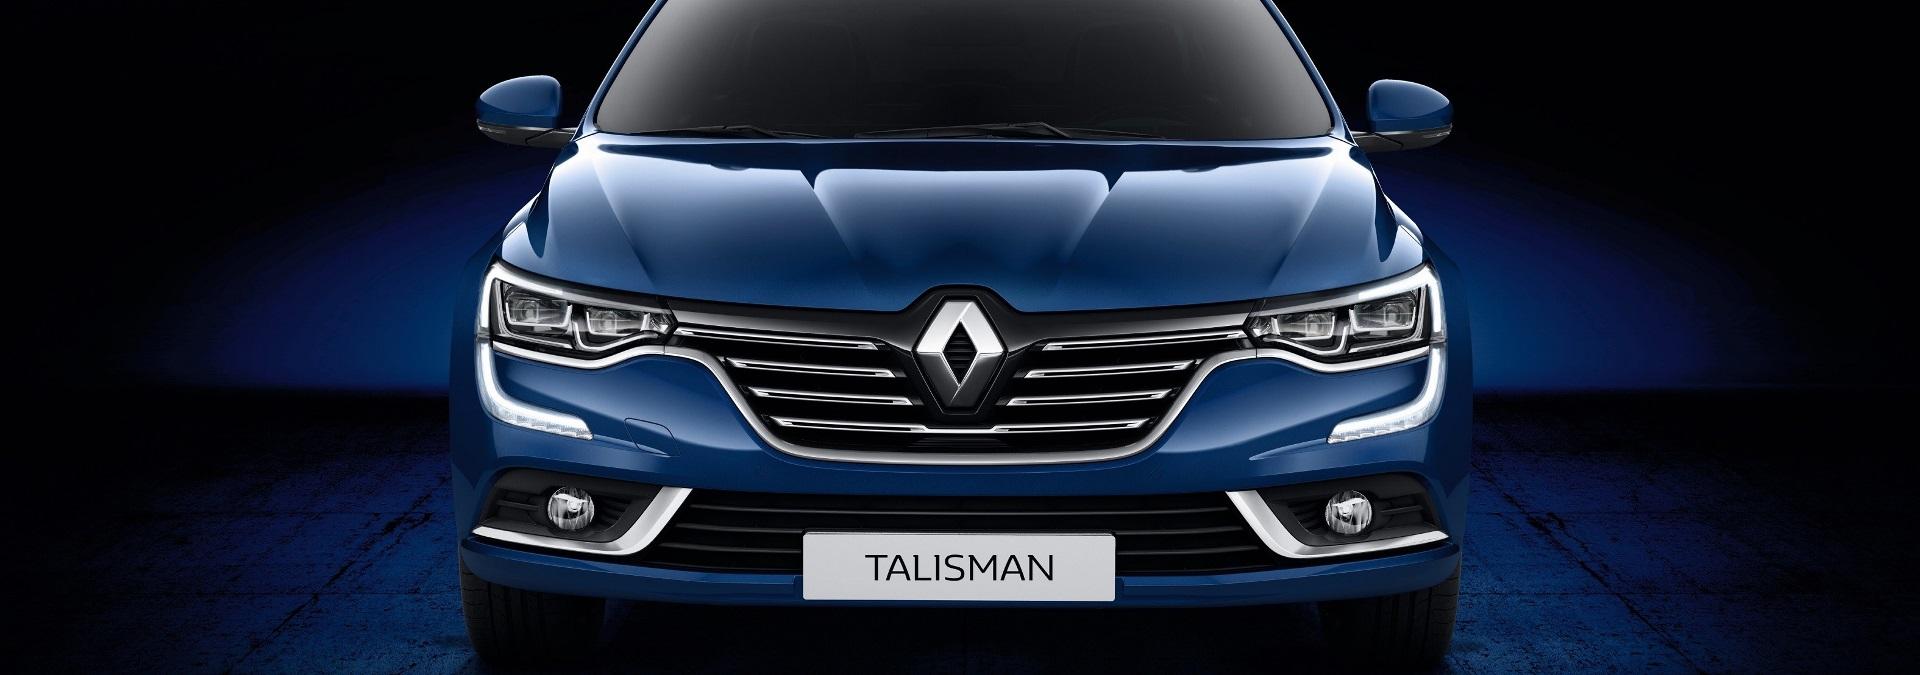 Renault Talisman_1920